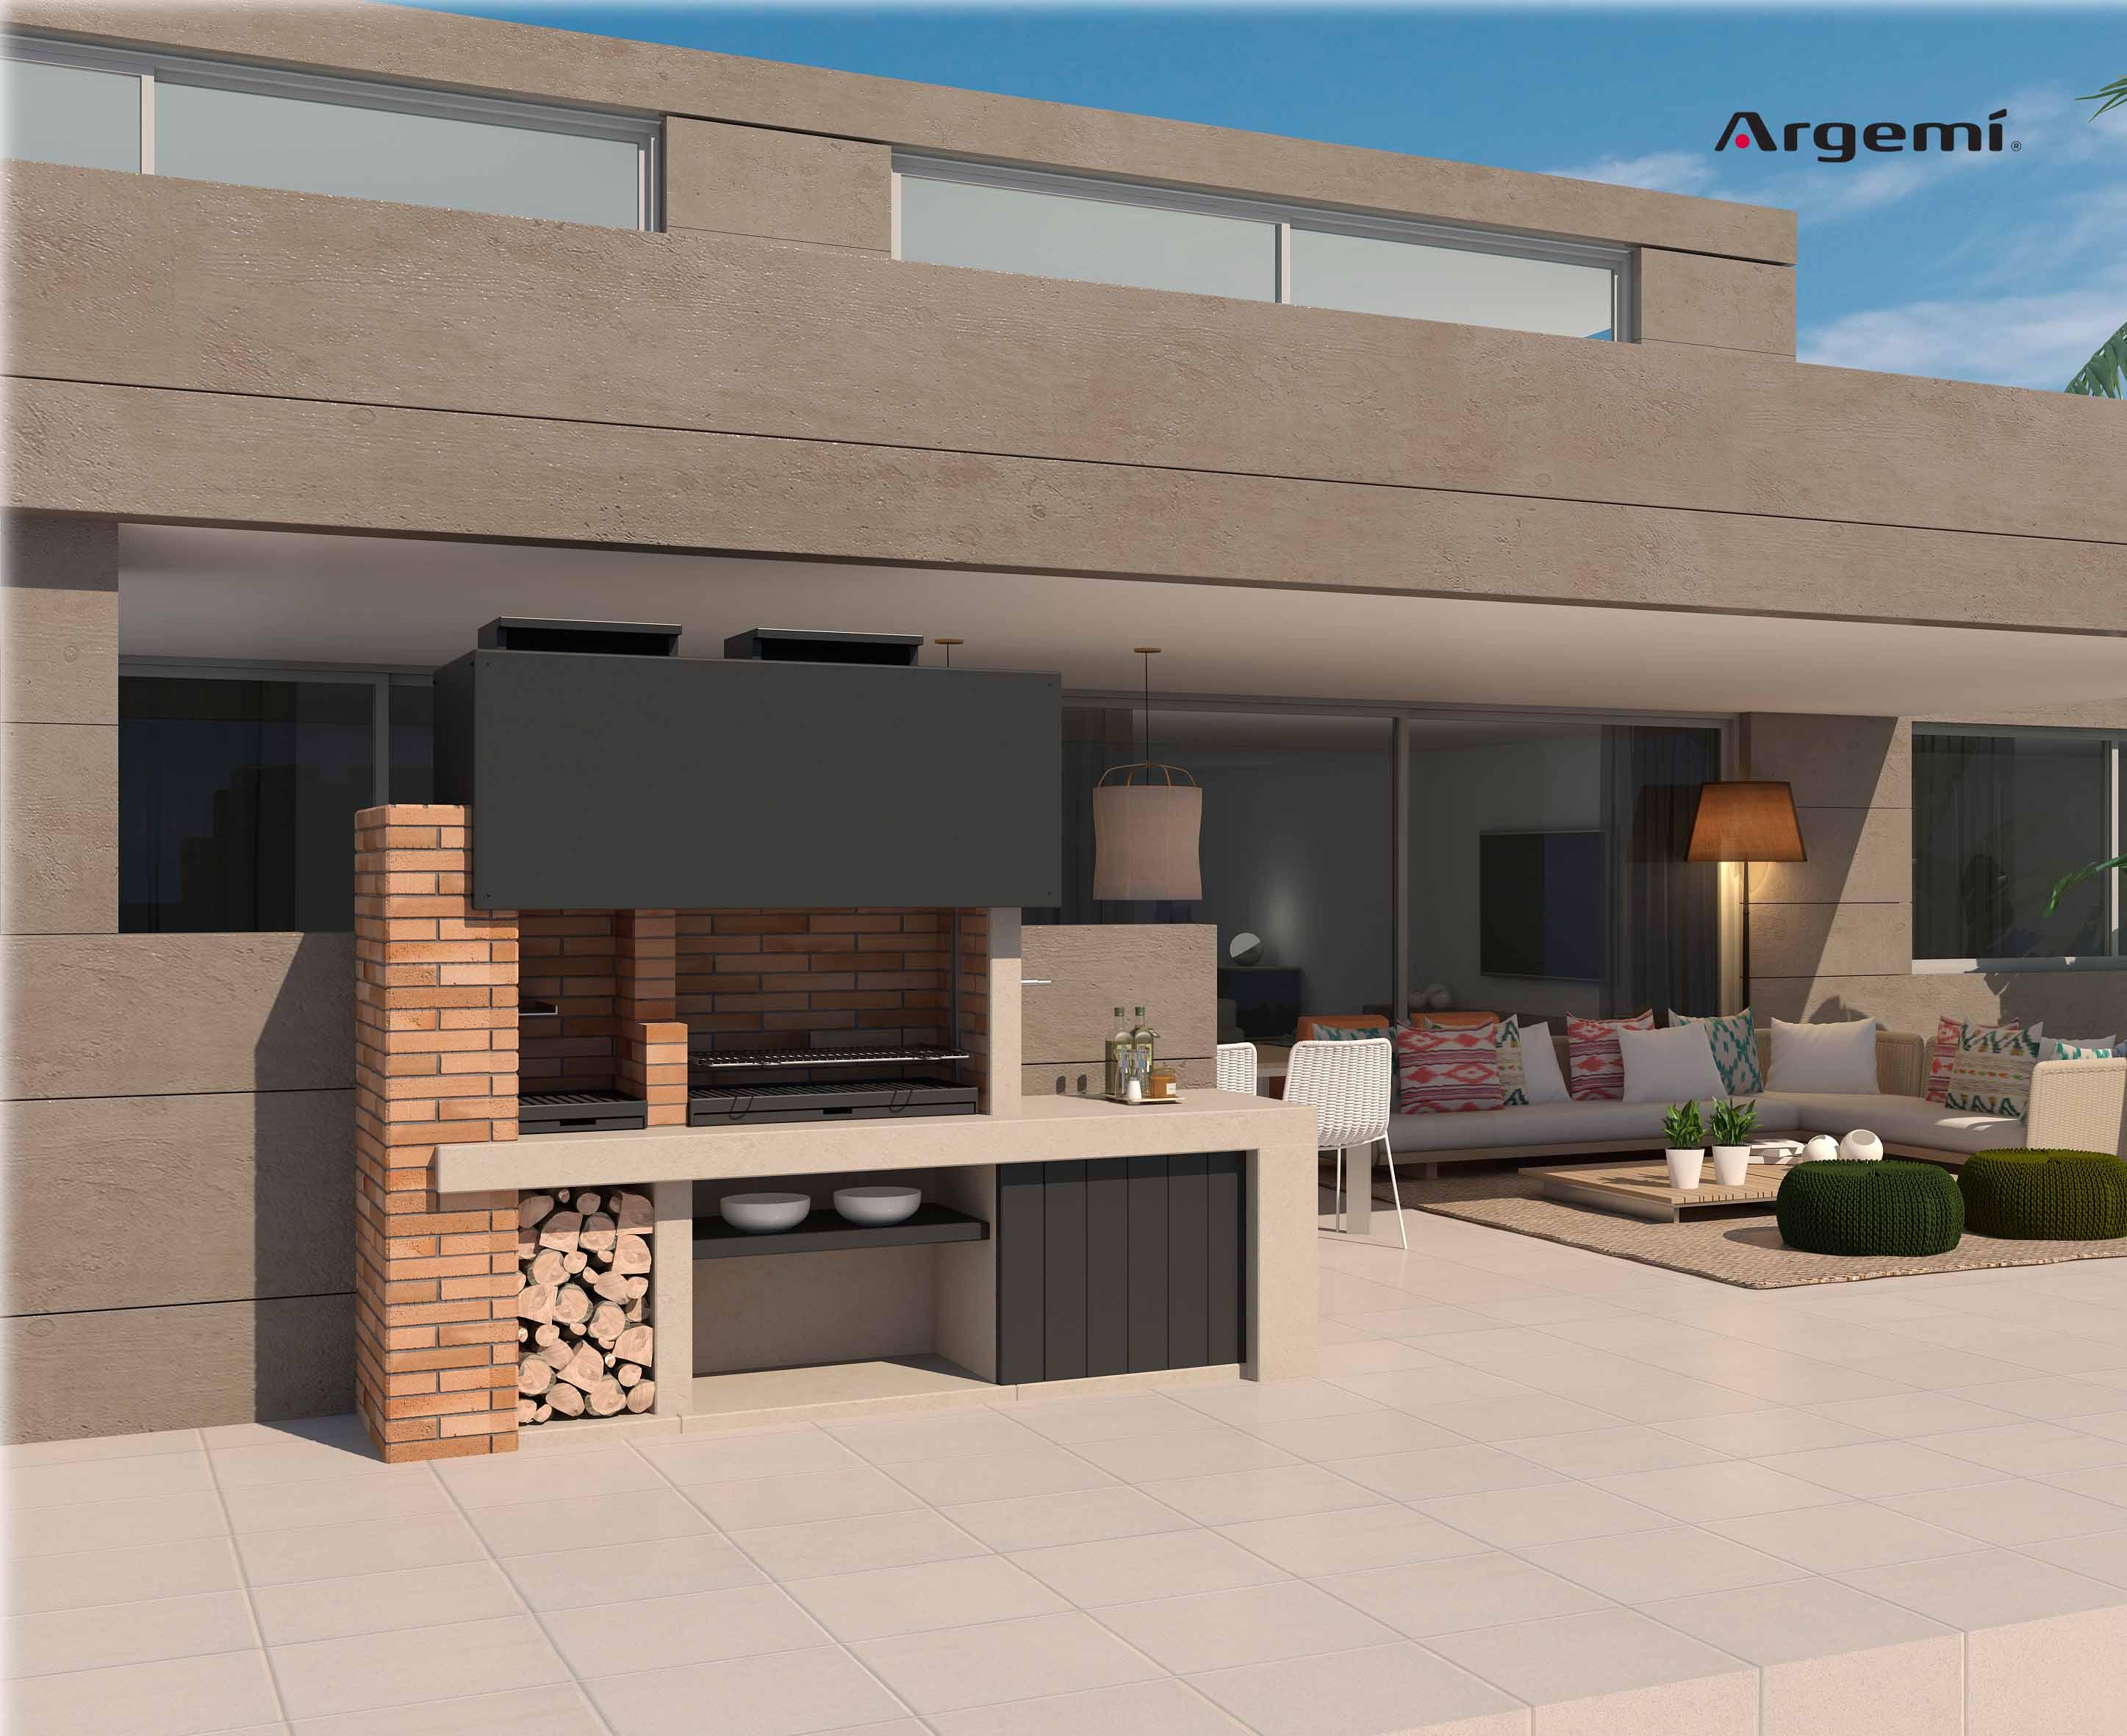 Barcelona Barbecue design - Argemi prefabricatsArgemi prefabricats